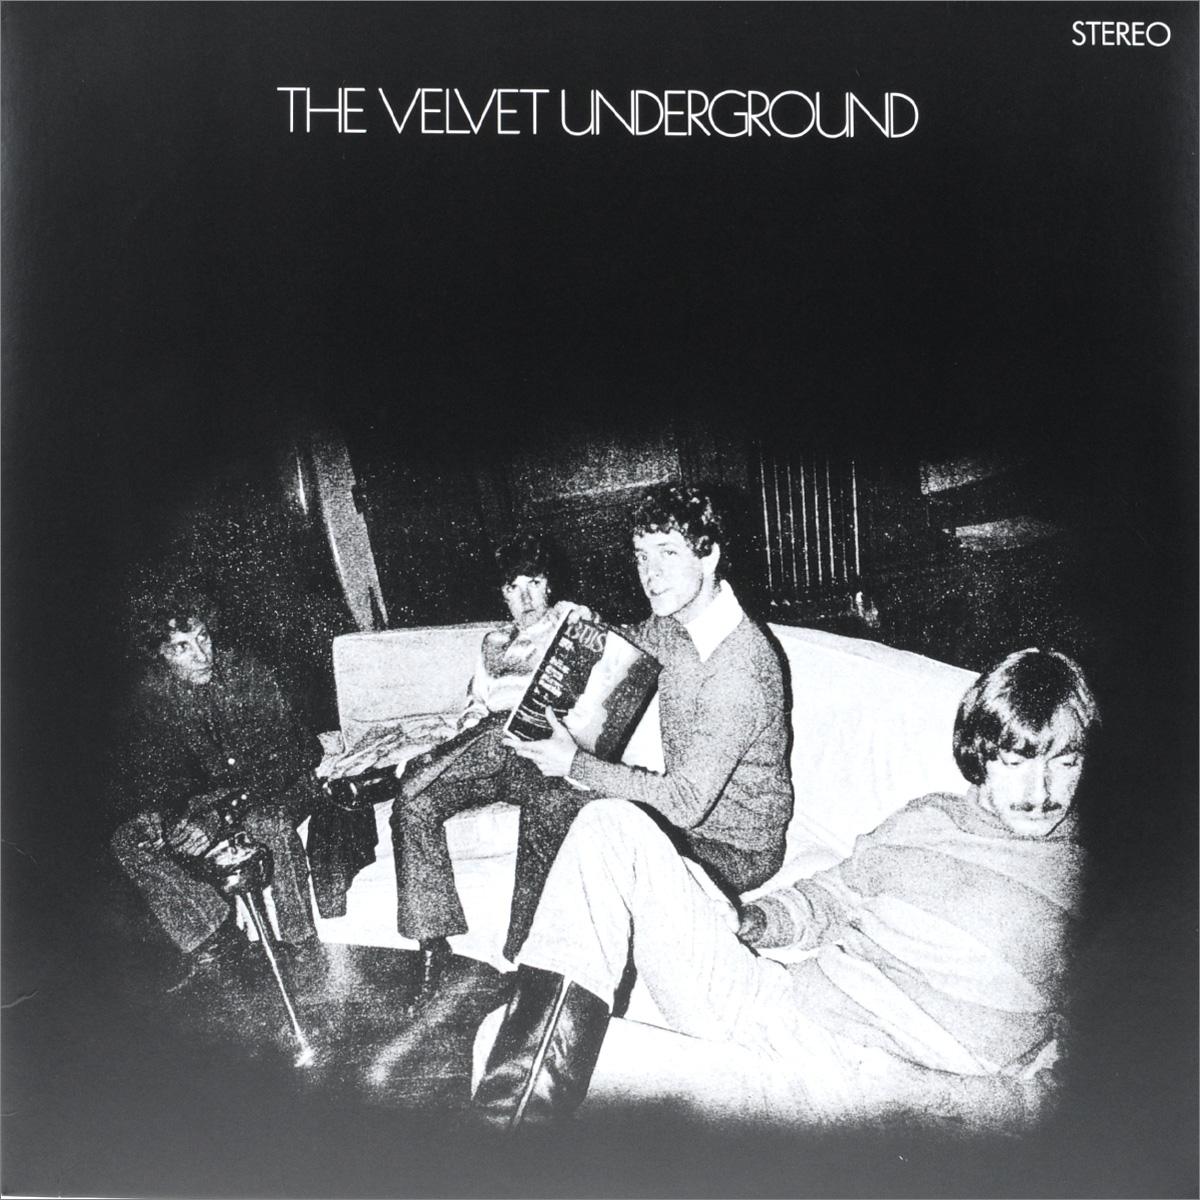 The Velvet Underground The Velvet Underground. The Velvet Underground (LP) 8pcs lot 50w cob underground floor recessed lamp foot lamp led underground lamps buried ground12v 24v 85 265v buried lights